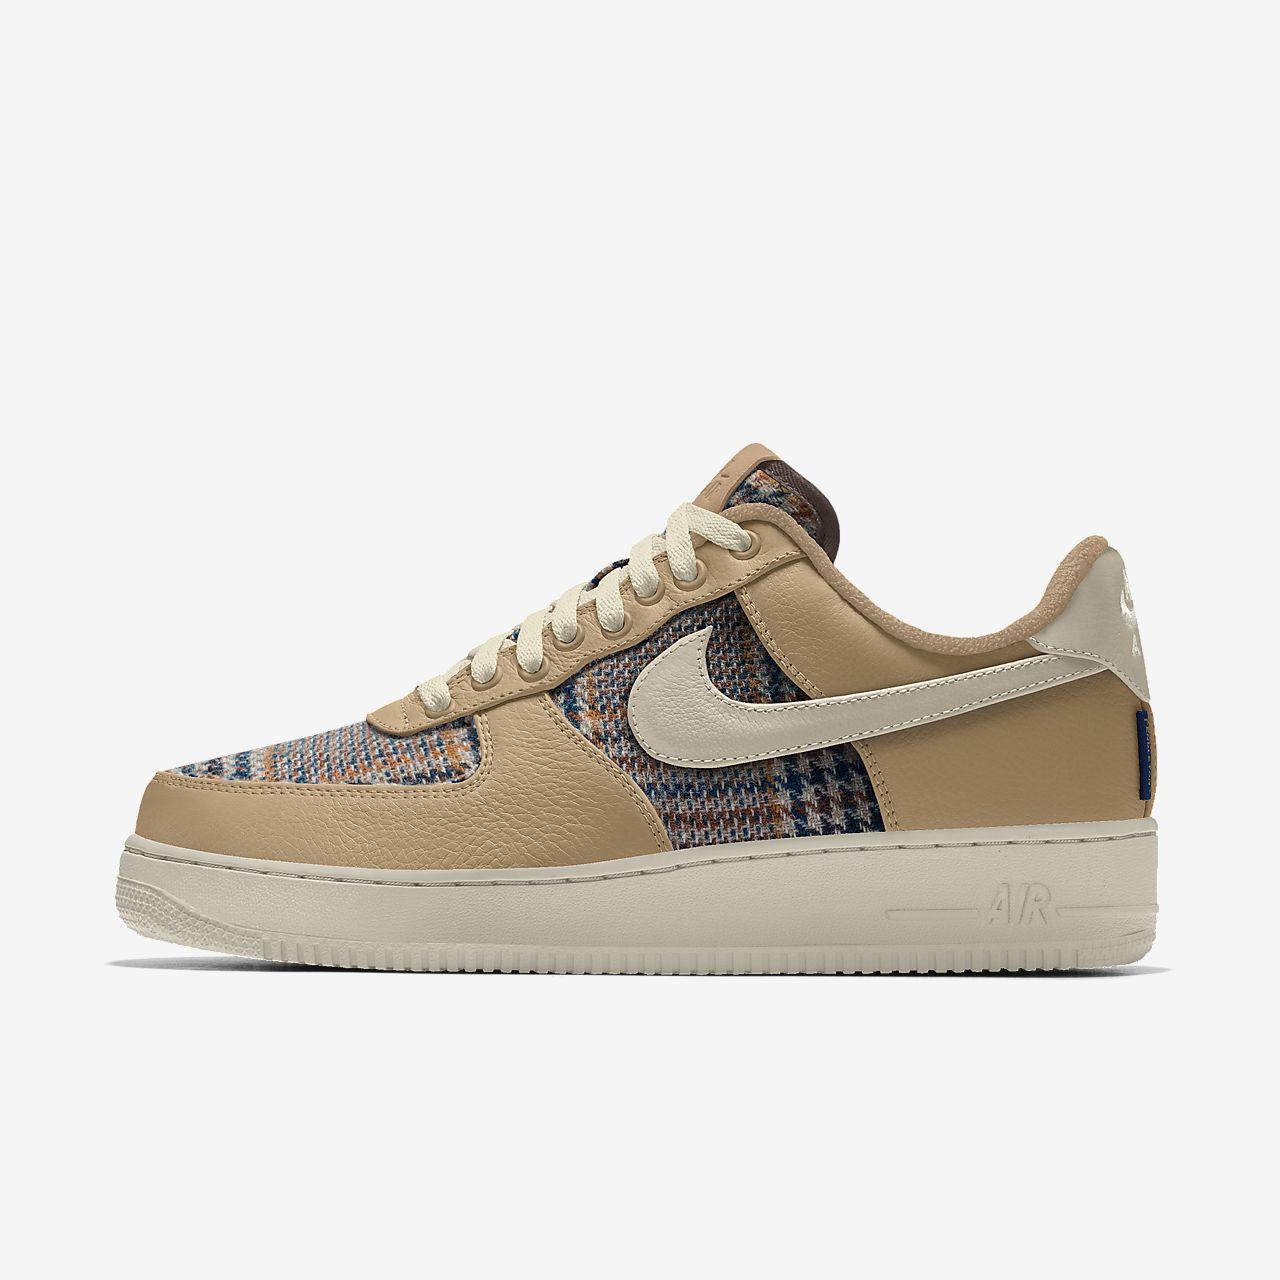 Nike Air Force 1 Low Pendleton By You Custom Women's Shoe